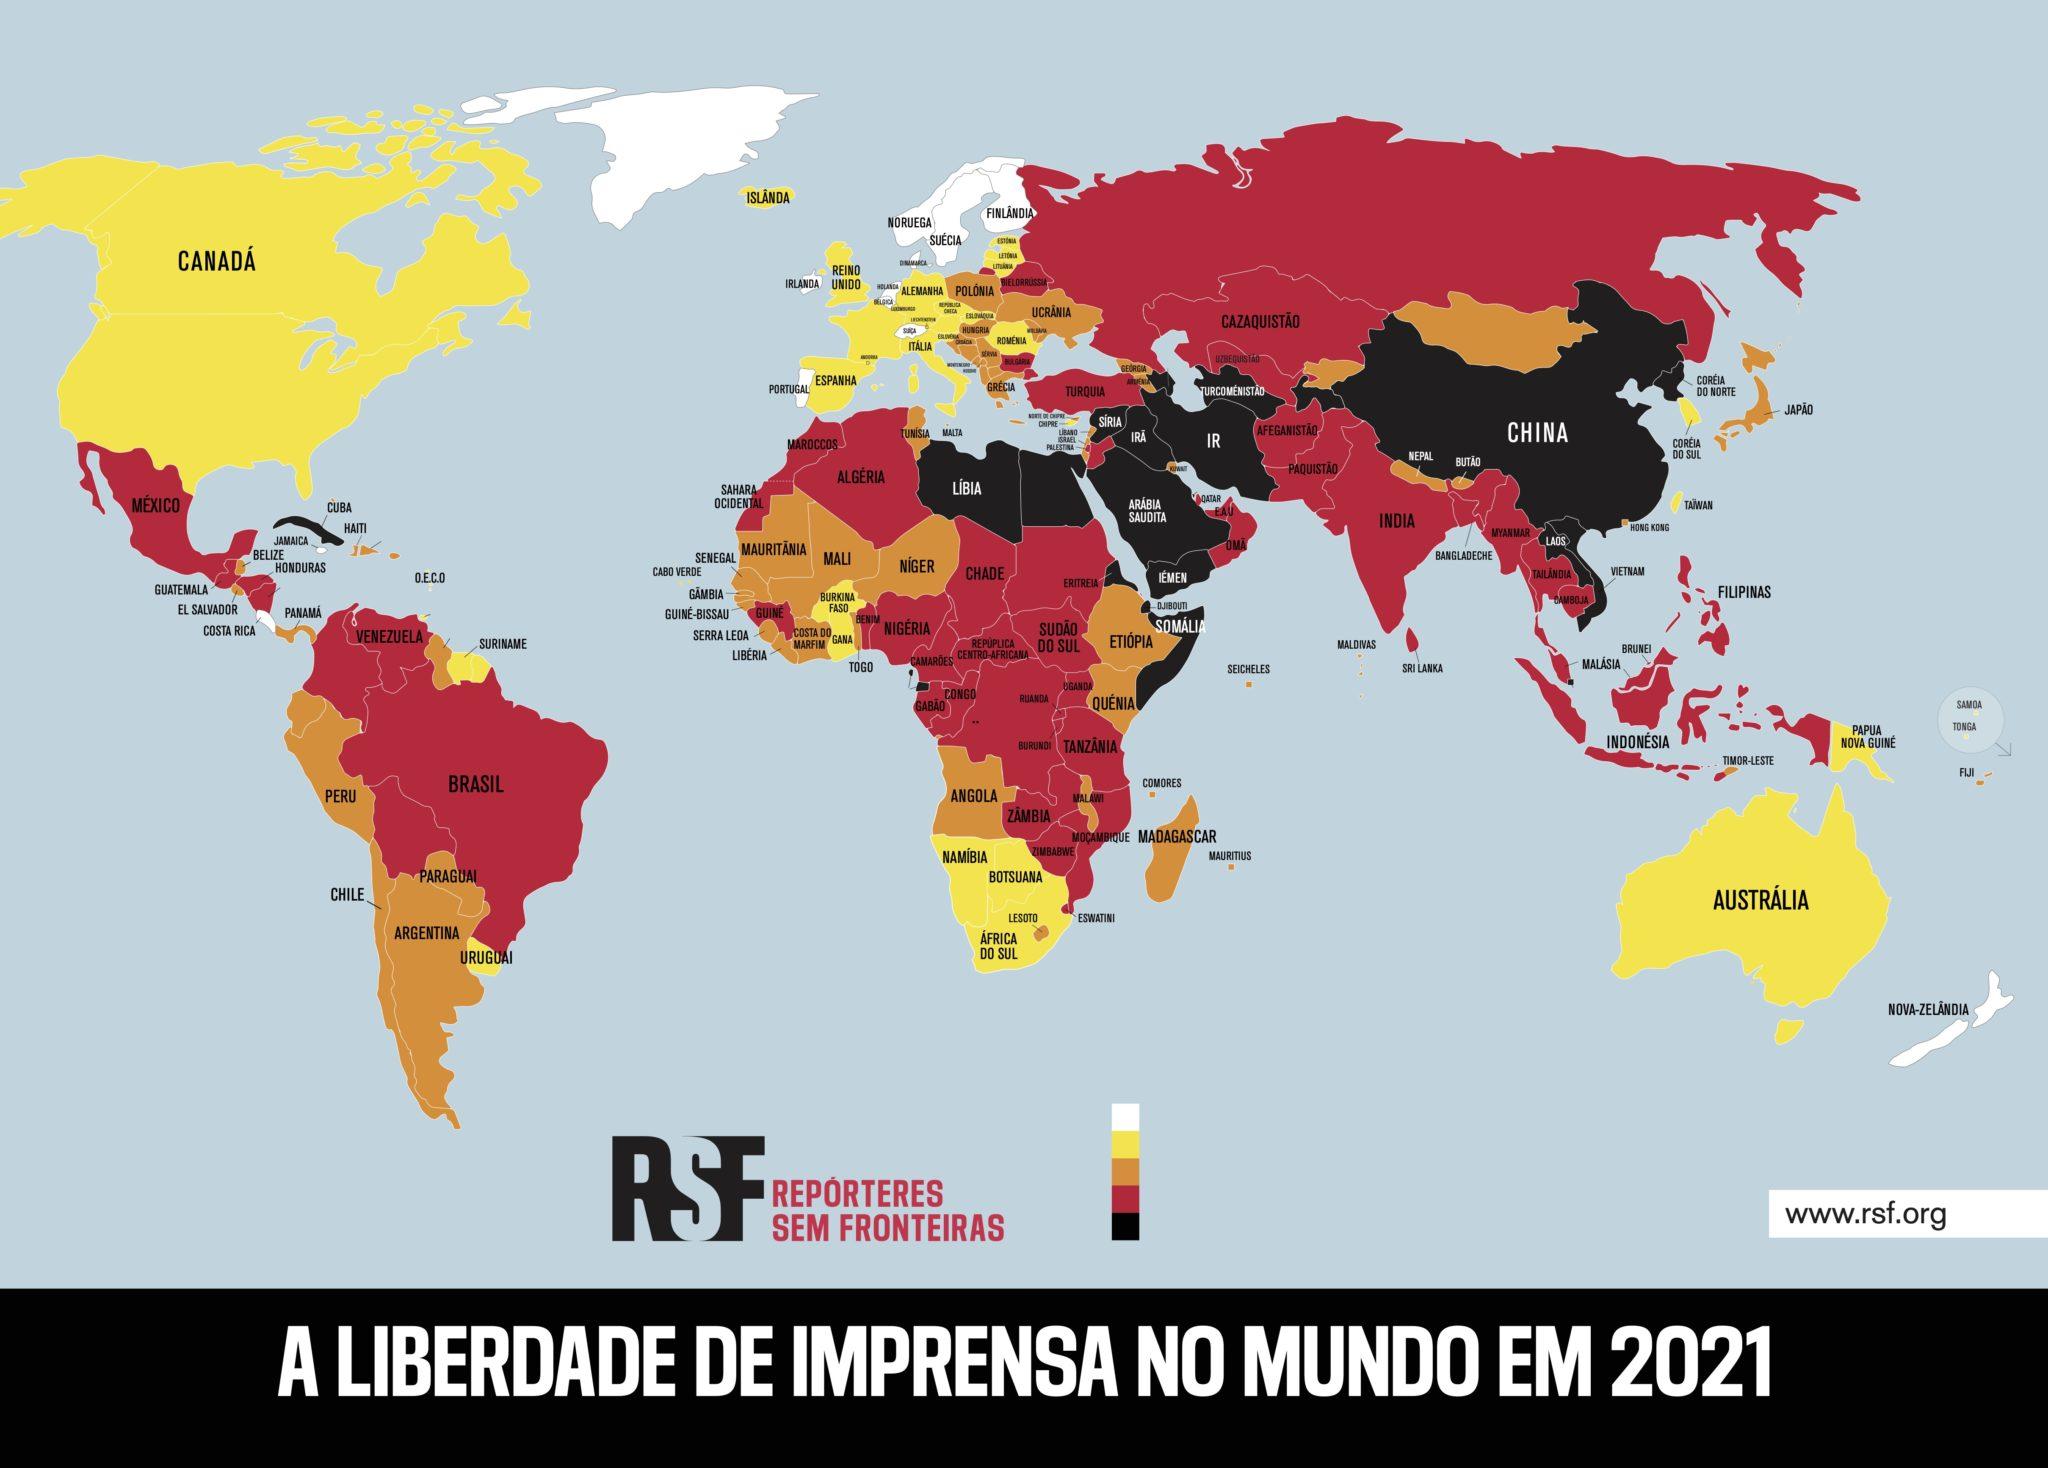 mapa-liberdade-imprensa